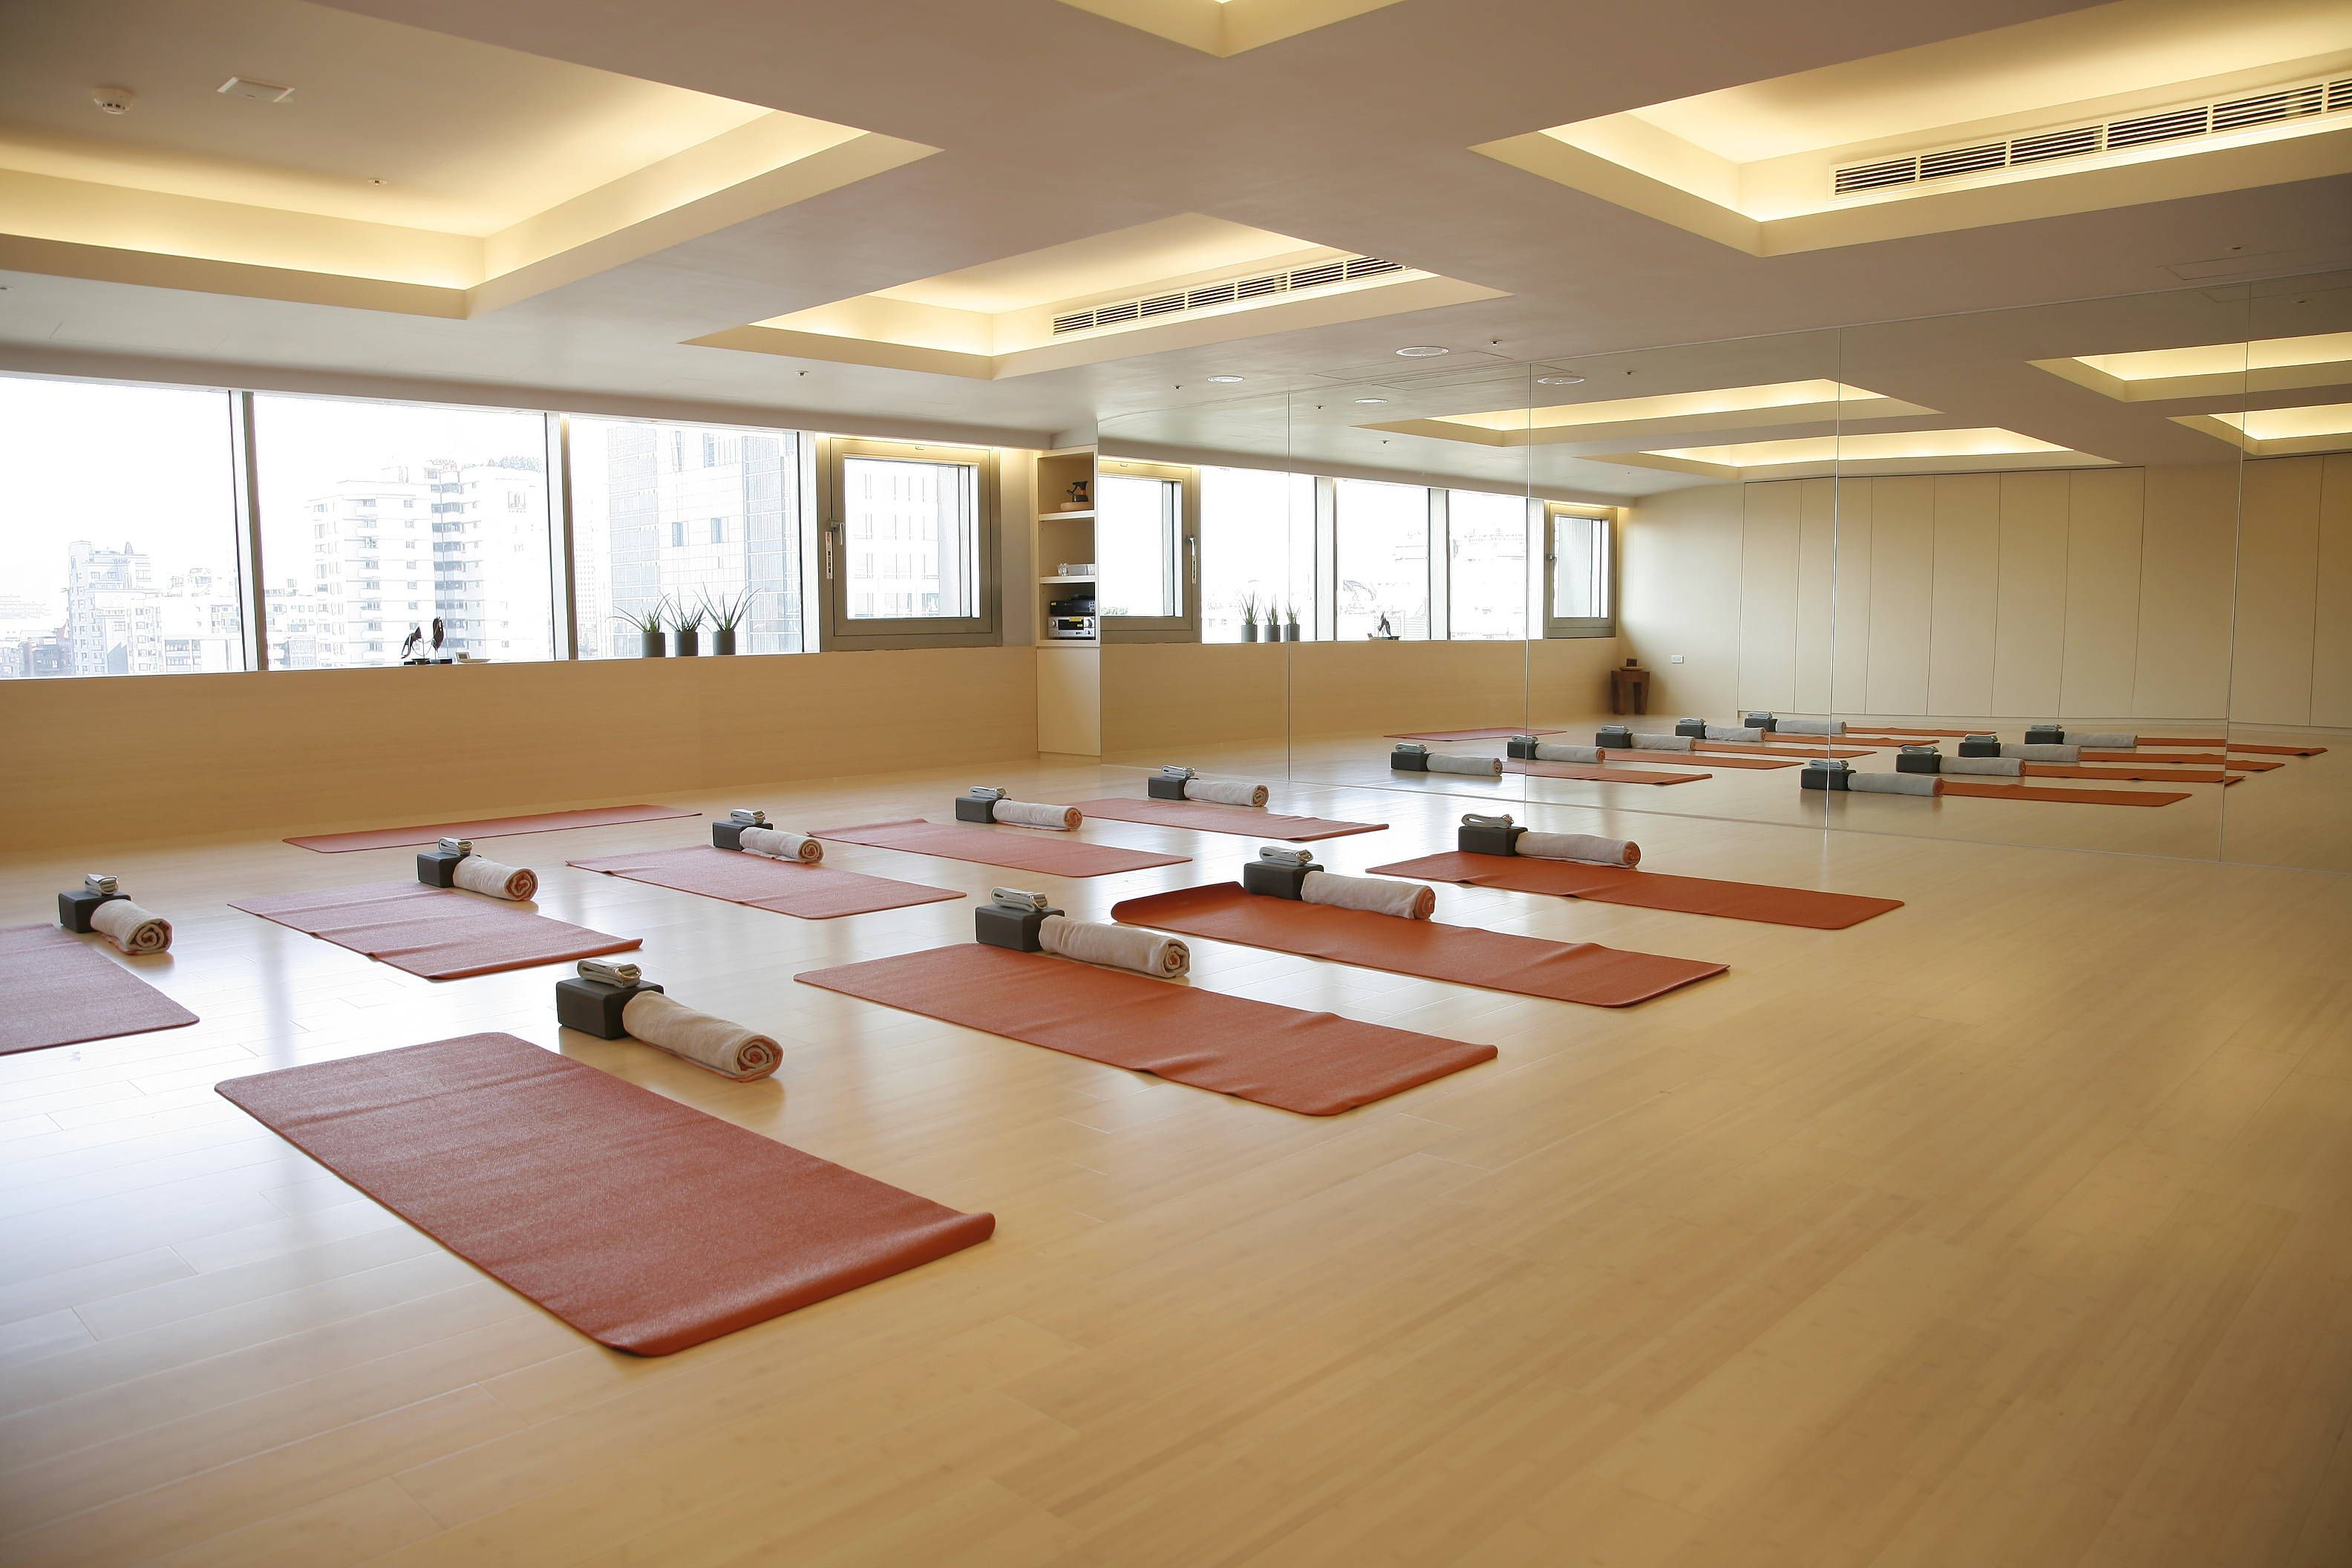 Luxury Yoga Room Google Search In Yoga Studio